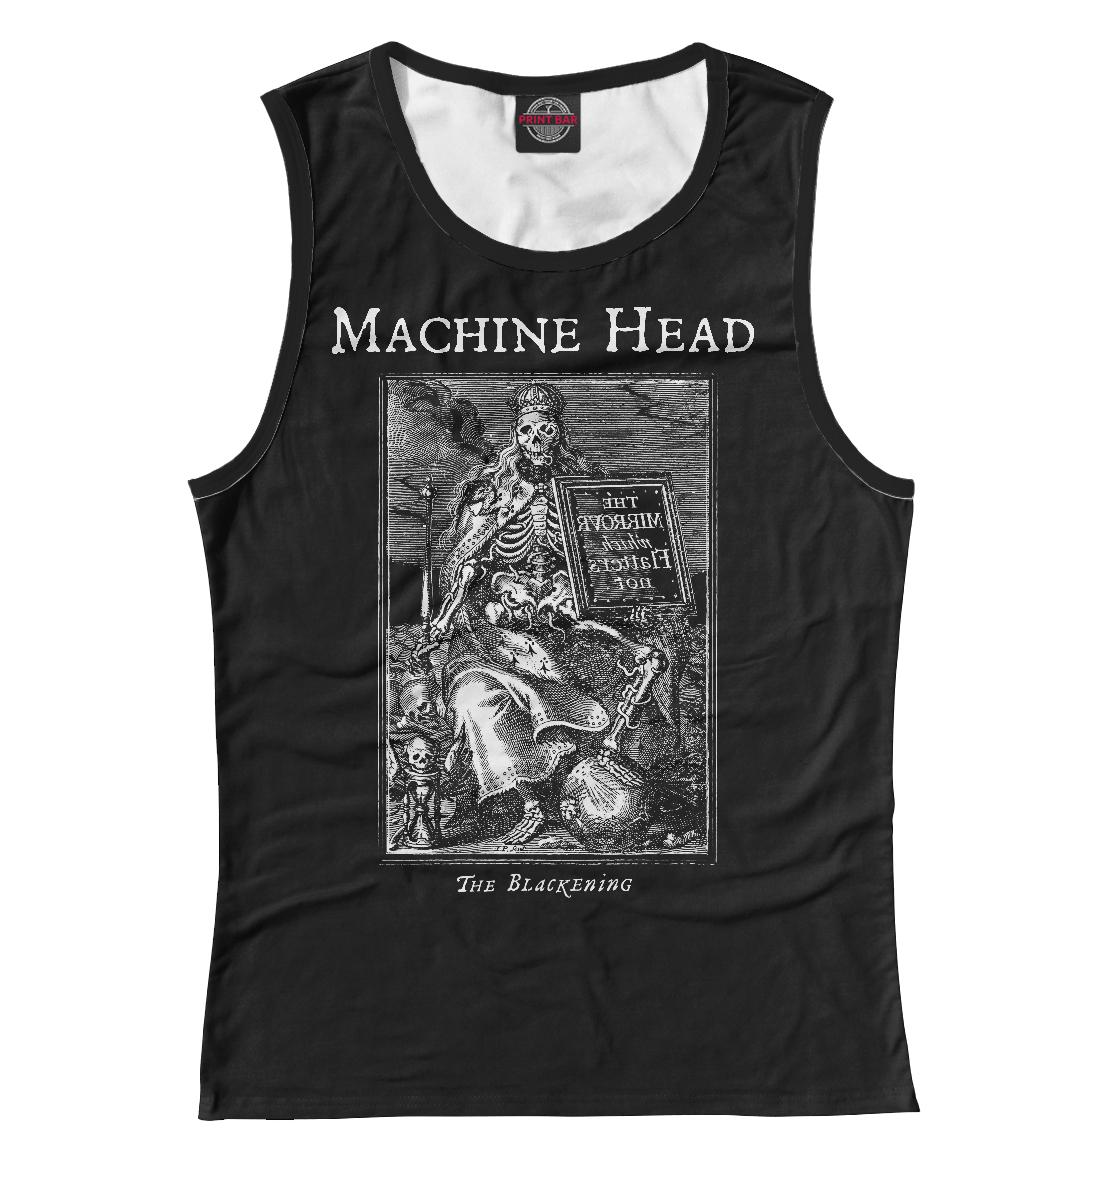 Купить Machine Head, Printbar, Майки, MZK-354049-may-1